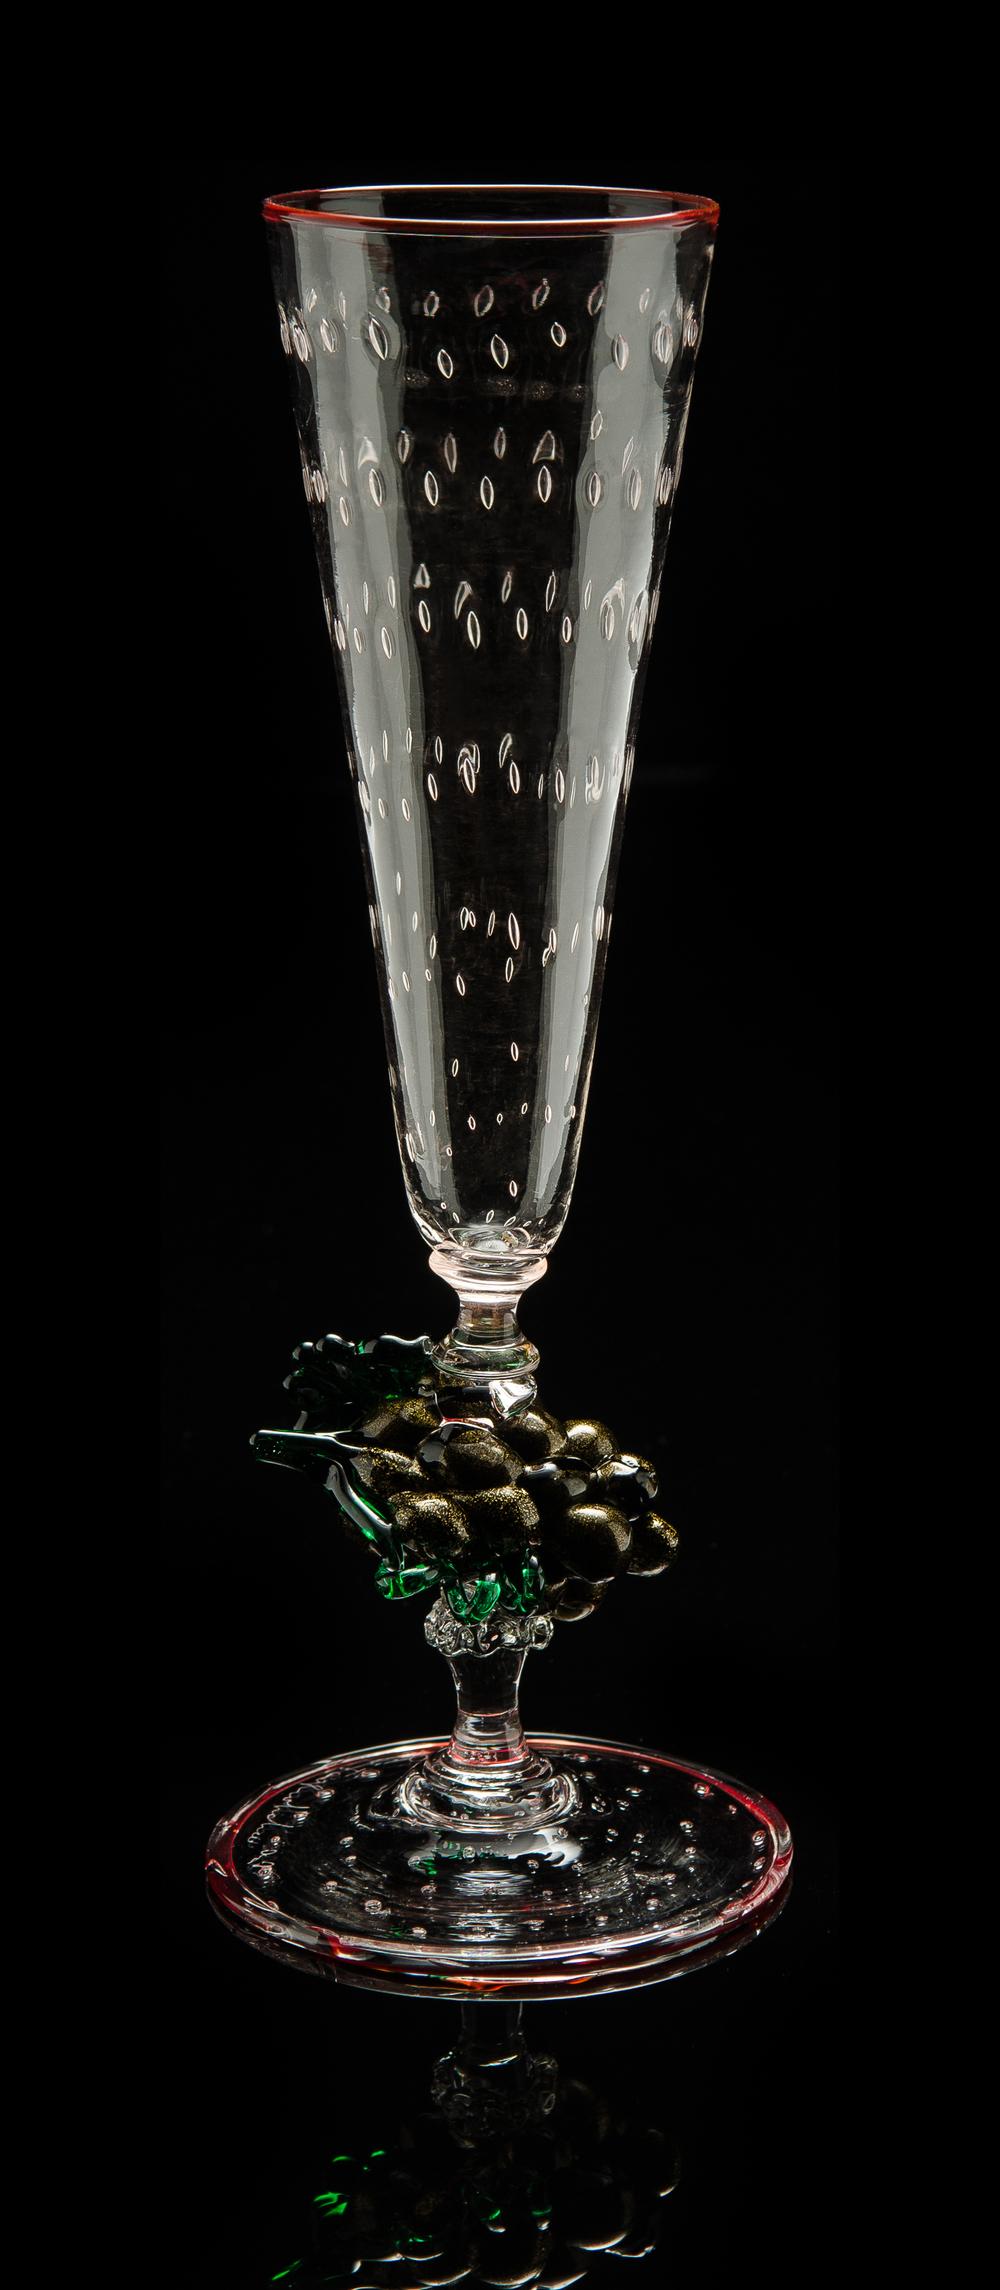 Lino Tagliapietra, Goblet (1991-1994, glass, 10 x 3 3/4 x 3 3/4inches), LT.86